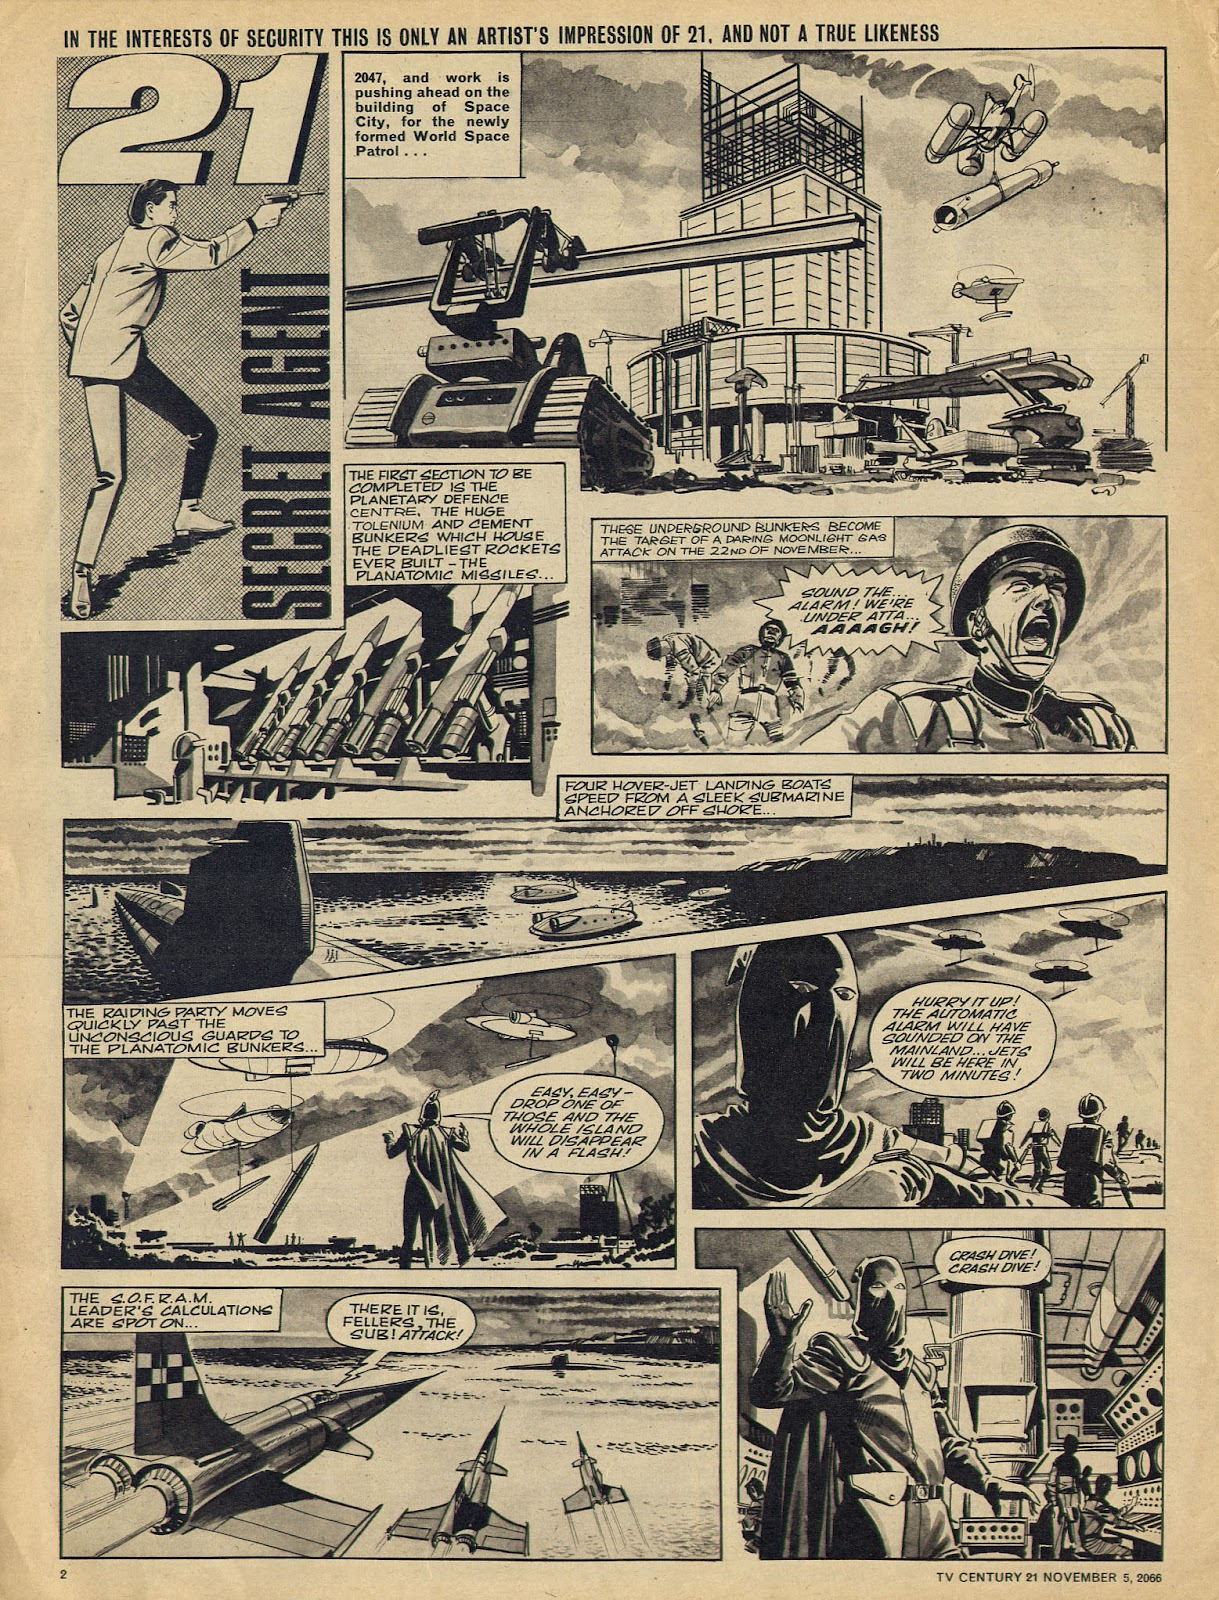 TV Century 21 (TV 21) issue 94 - Page 2